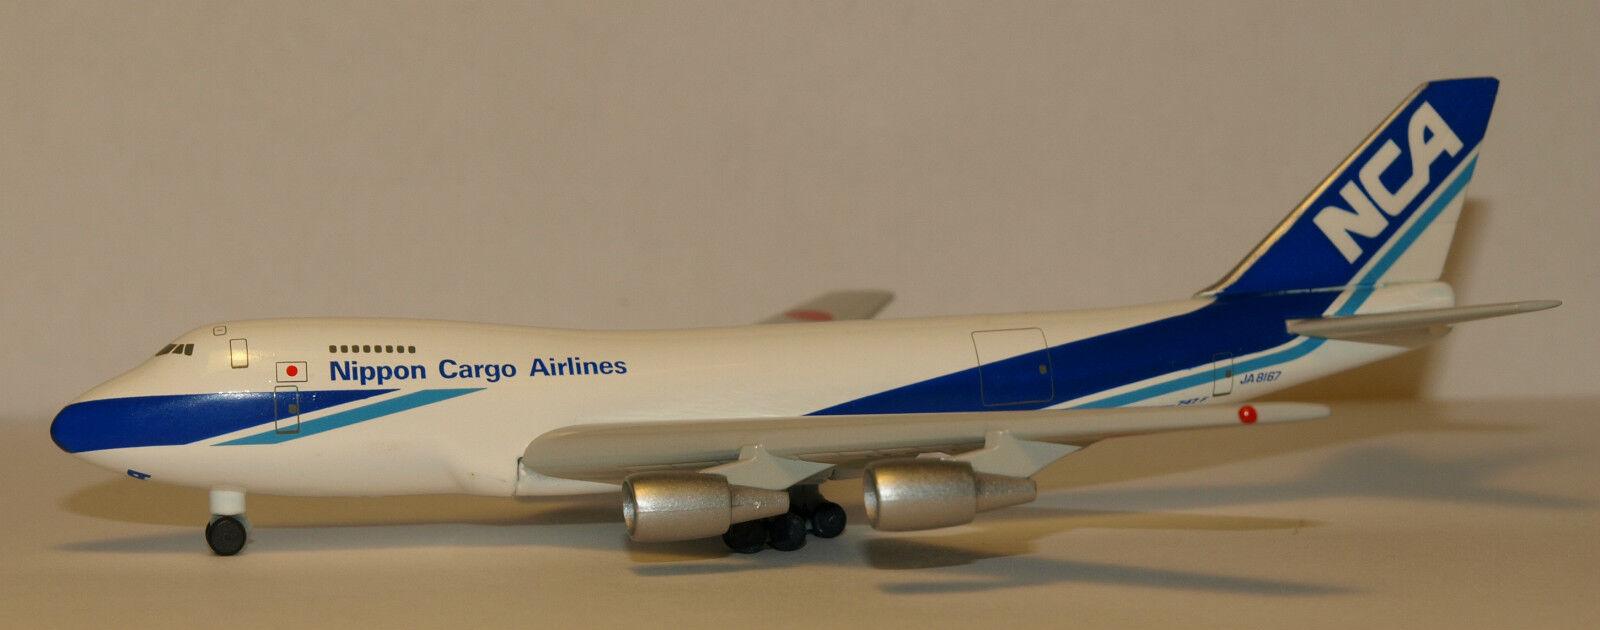 Herpa Wings 1 500 Nippon Cargo NCA Boeing 747-200F prod id 502566 released 1999